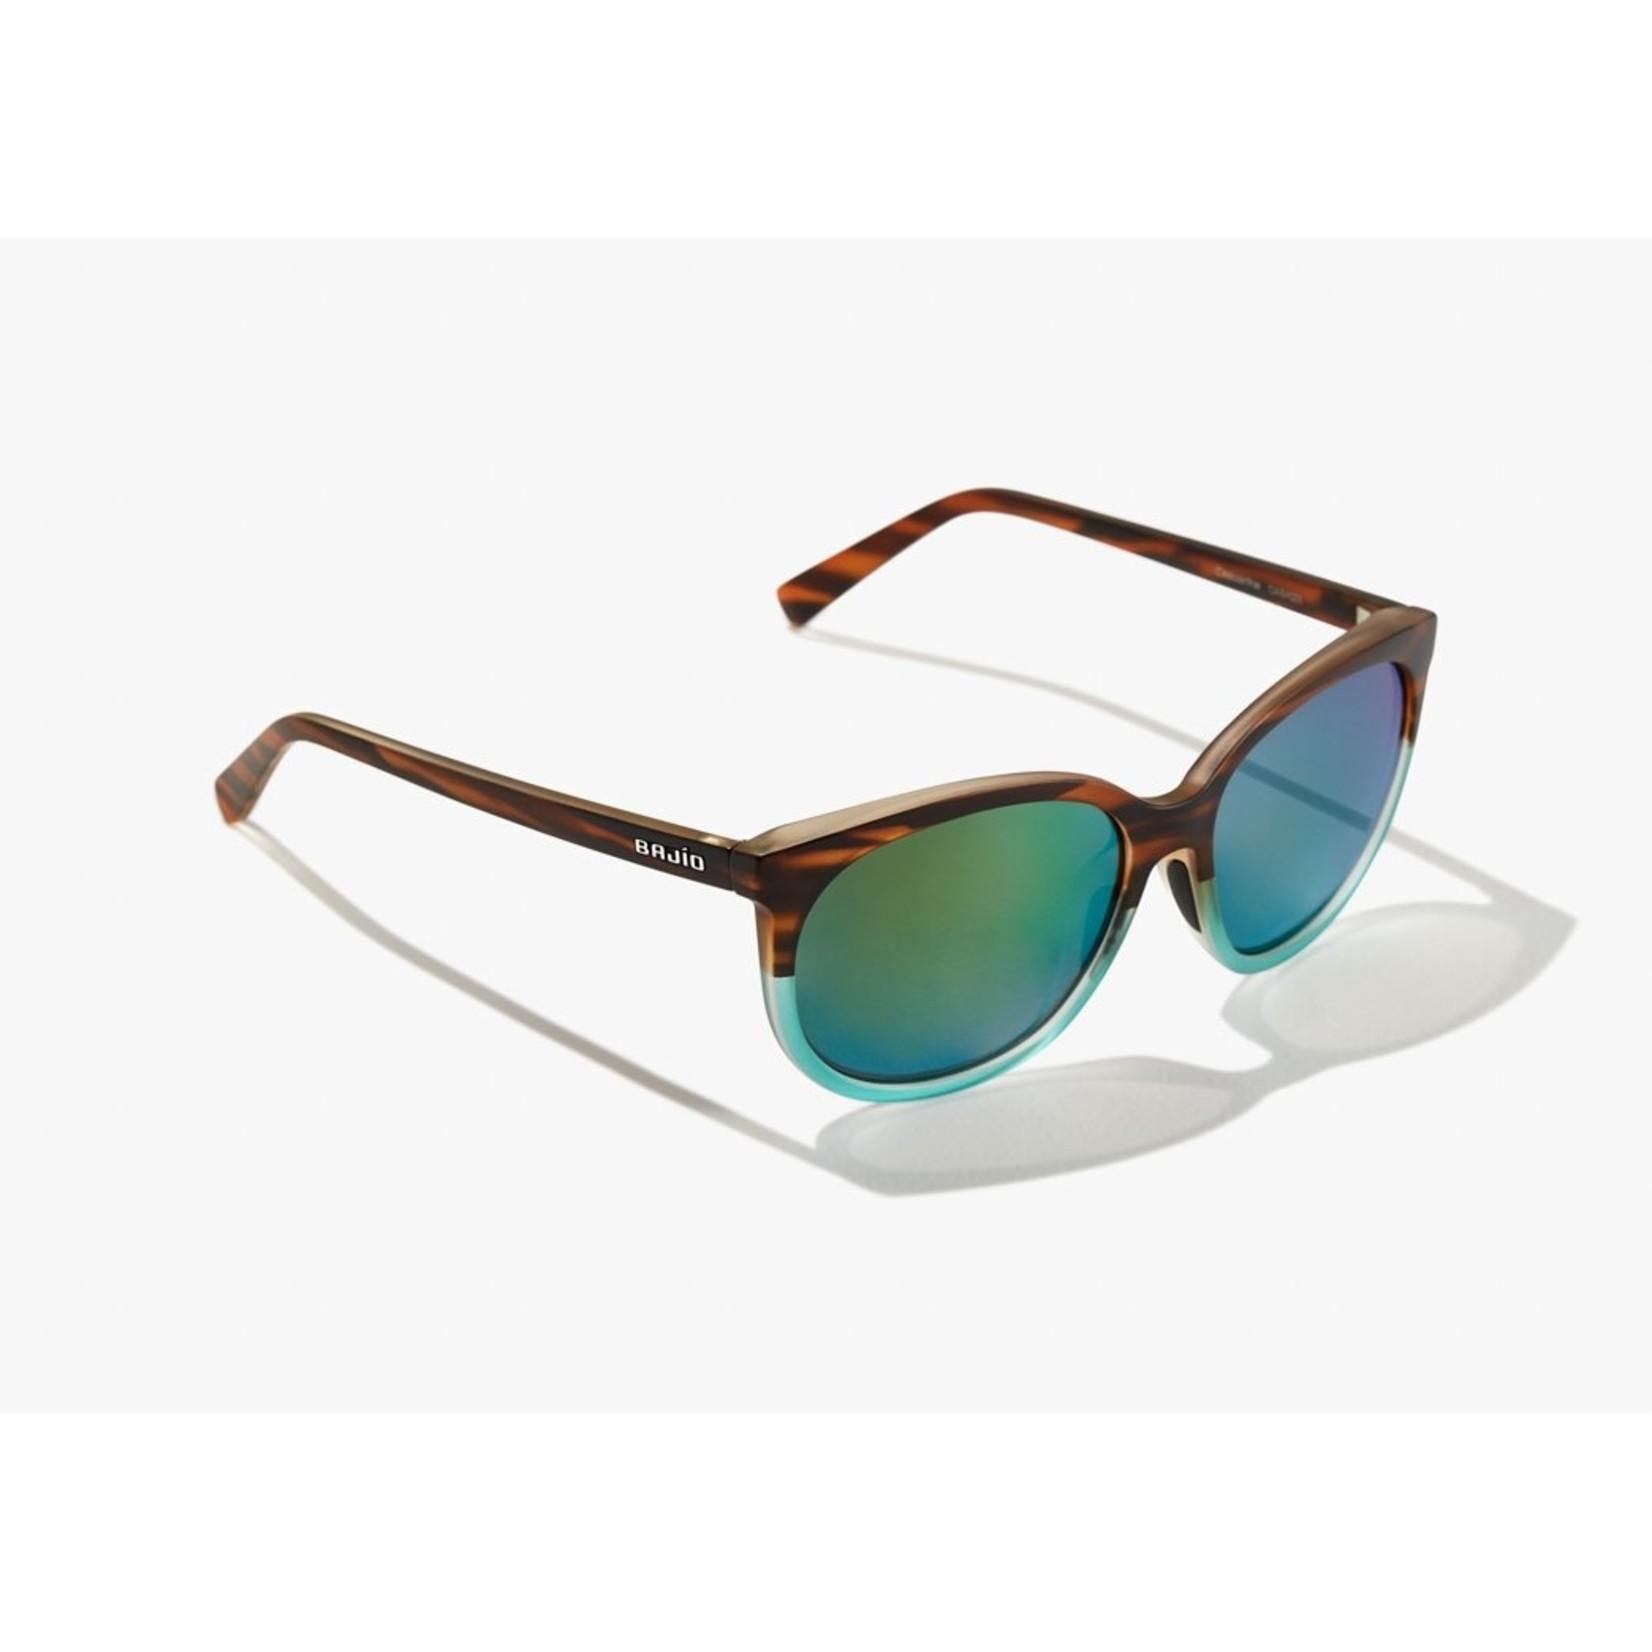 Bajio Bajio Casuarina Polarized Sunglasses